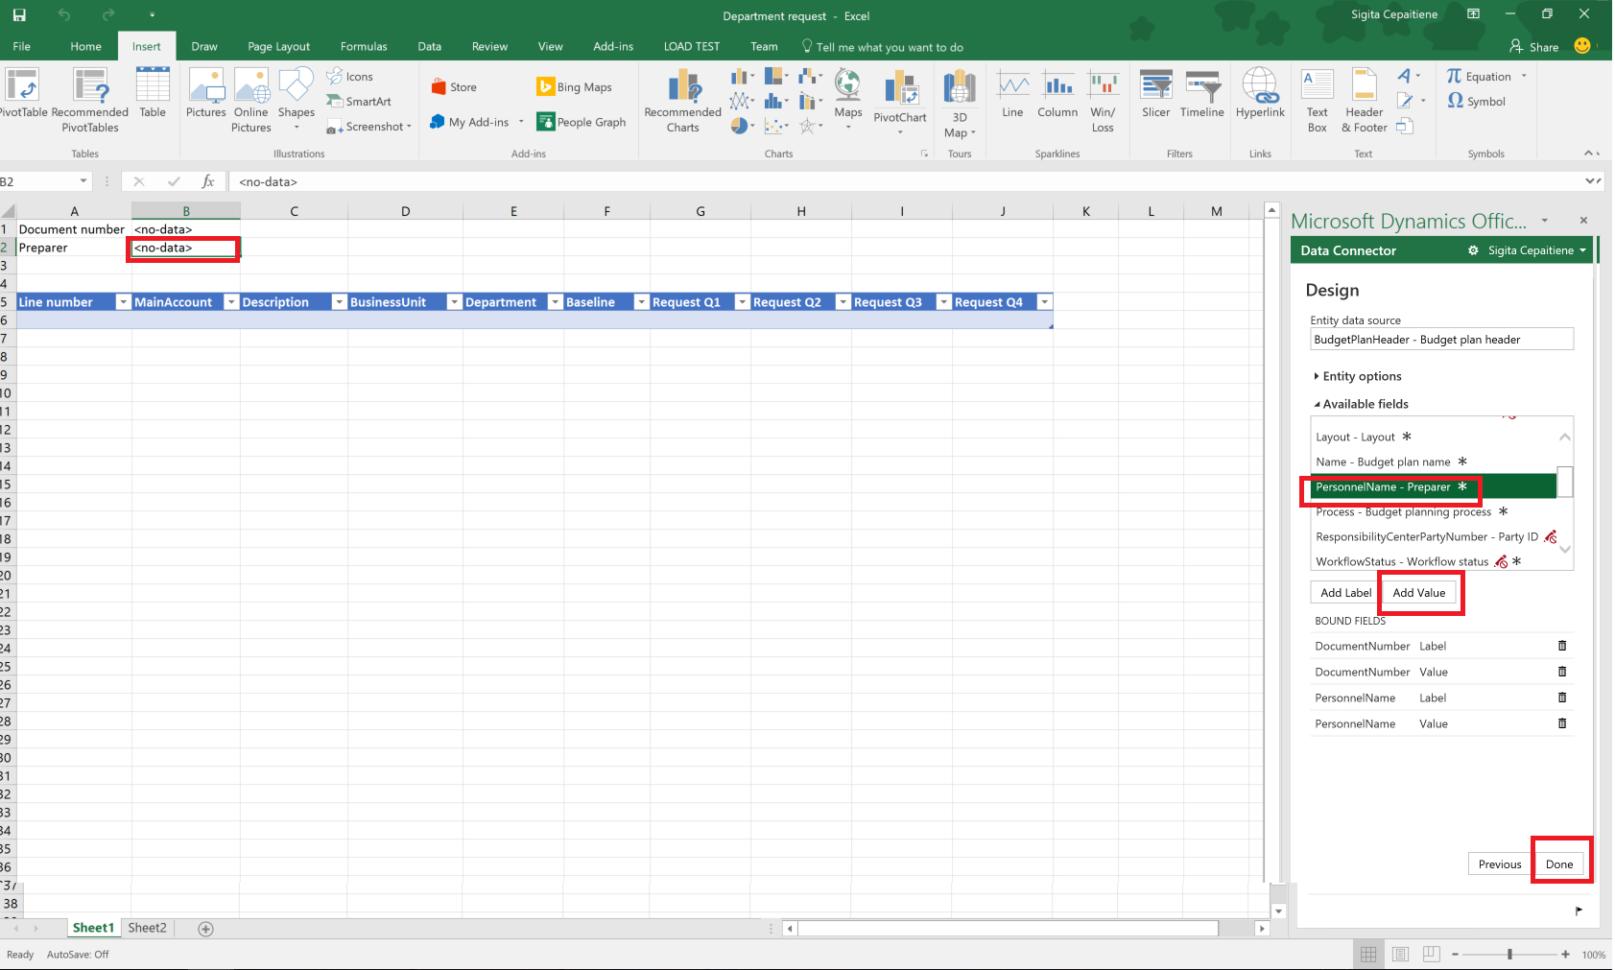 bonus spreadsheet template  Bonus Spreadsheet Template Regarding Budget Planning Templates For Excel  Finance  Operations Bonus Spreadsheet Template Printable Spreadshee